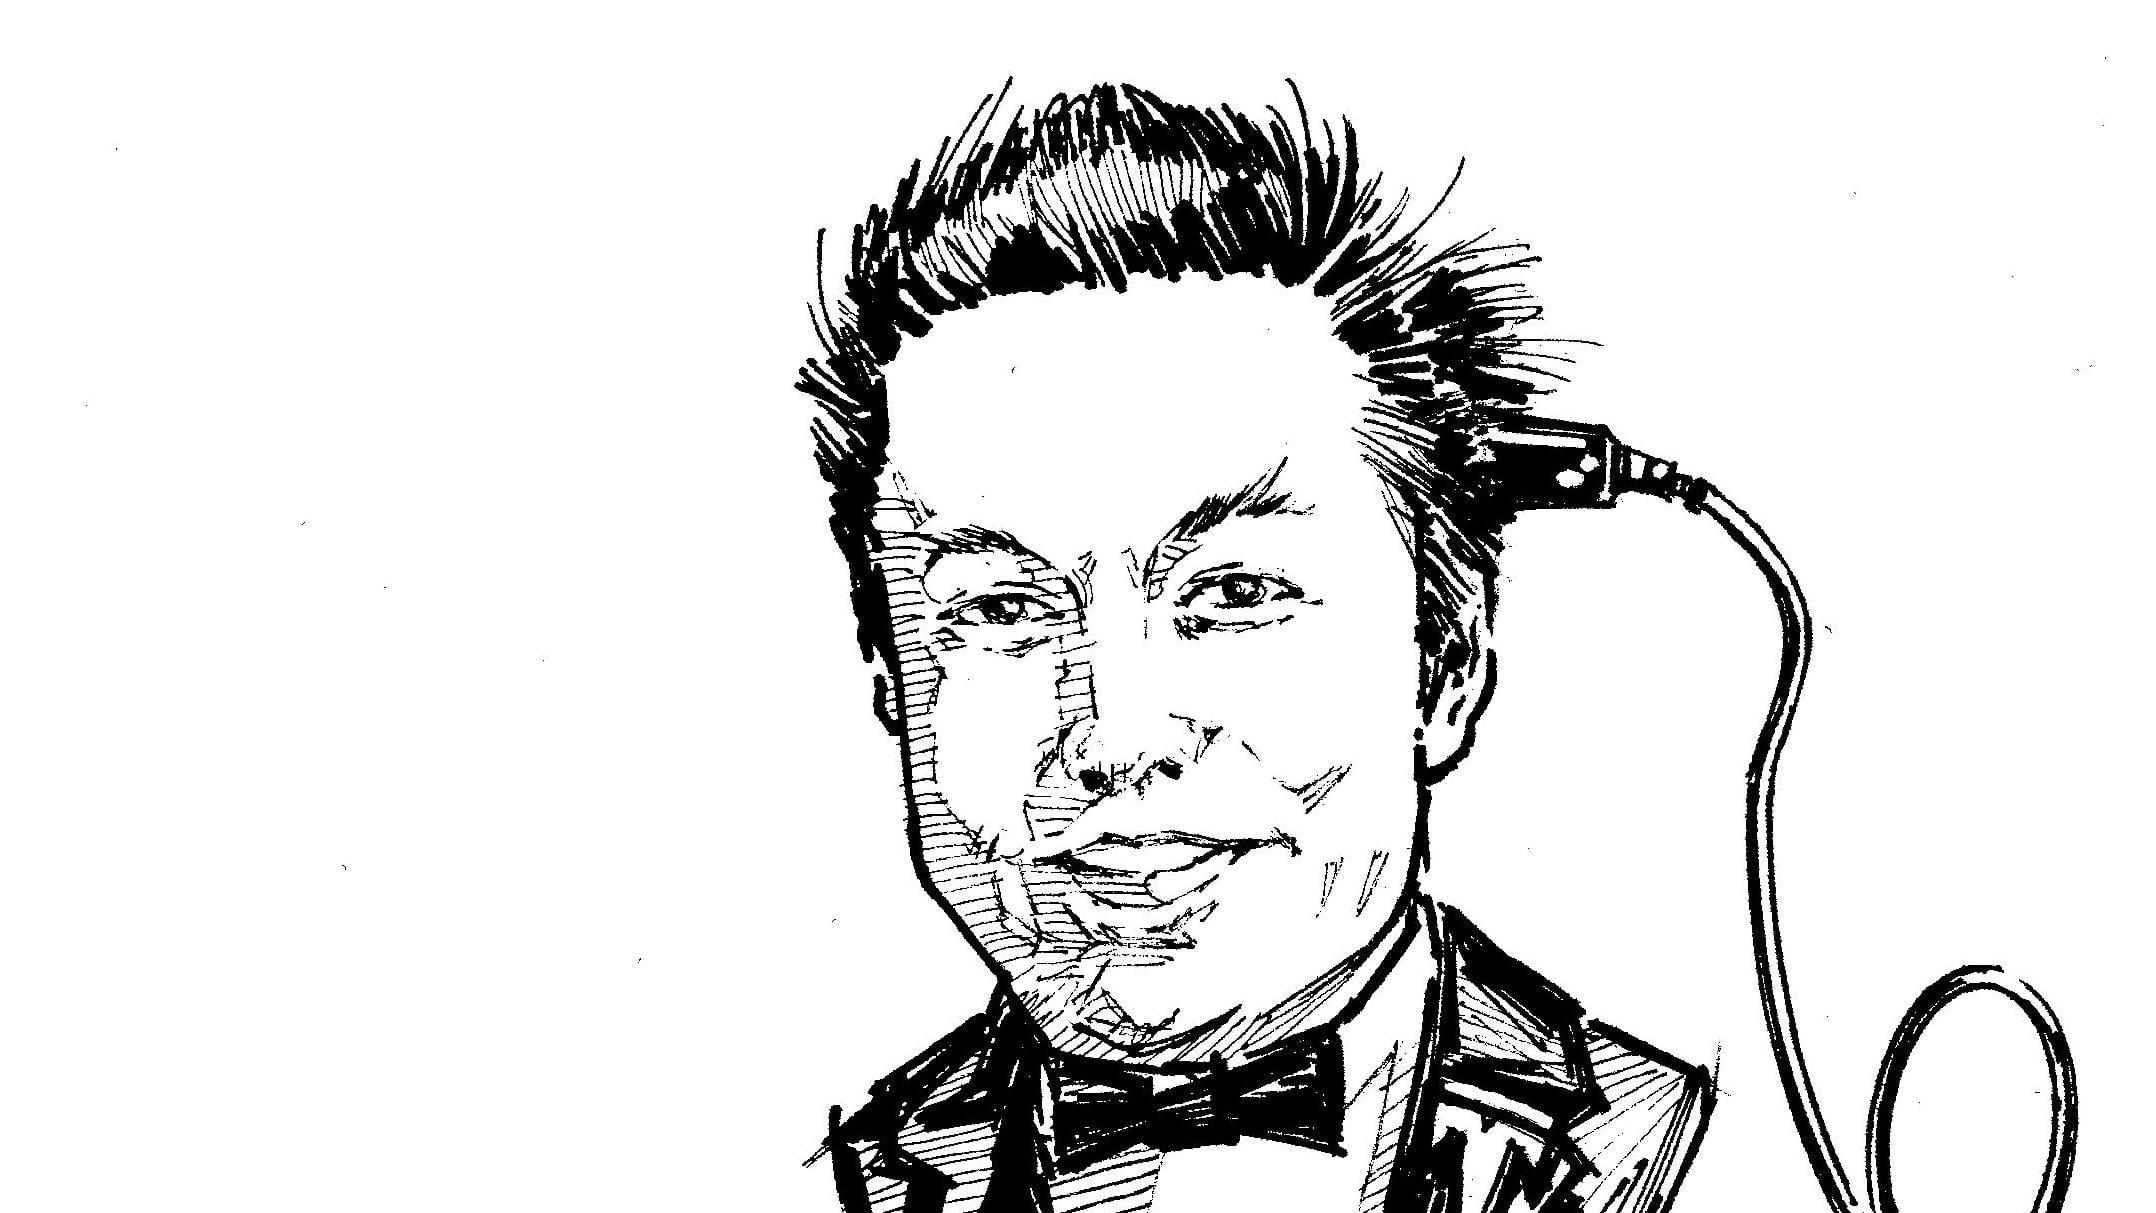 Hector Cademartoris artwork featuring Elon Musk